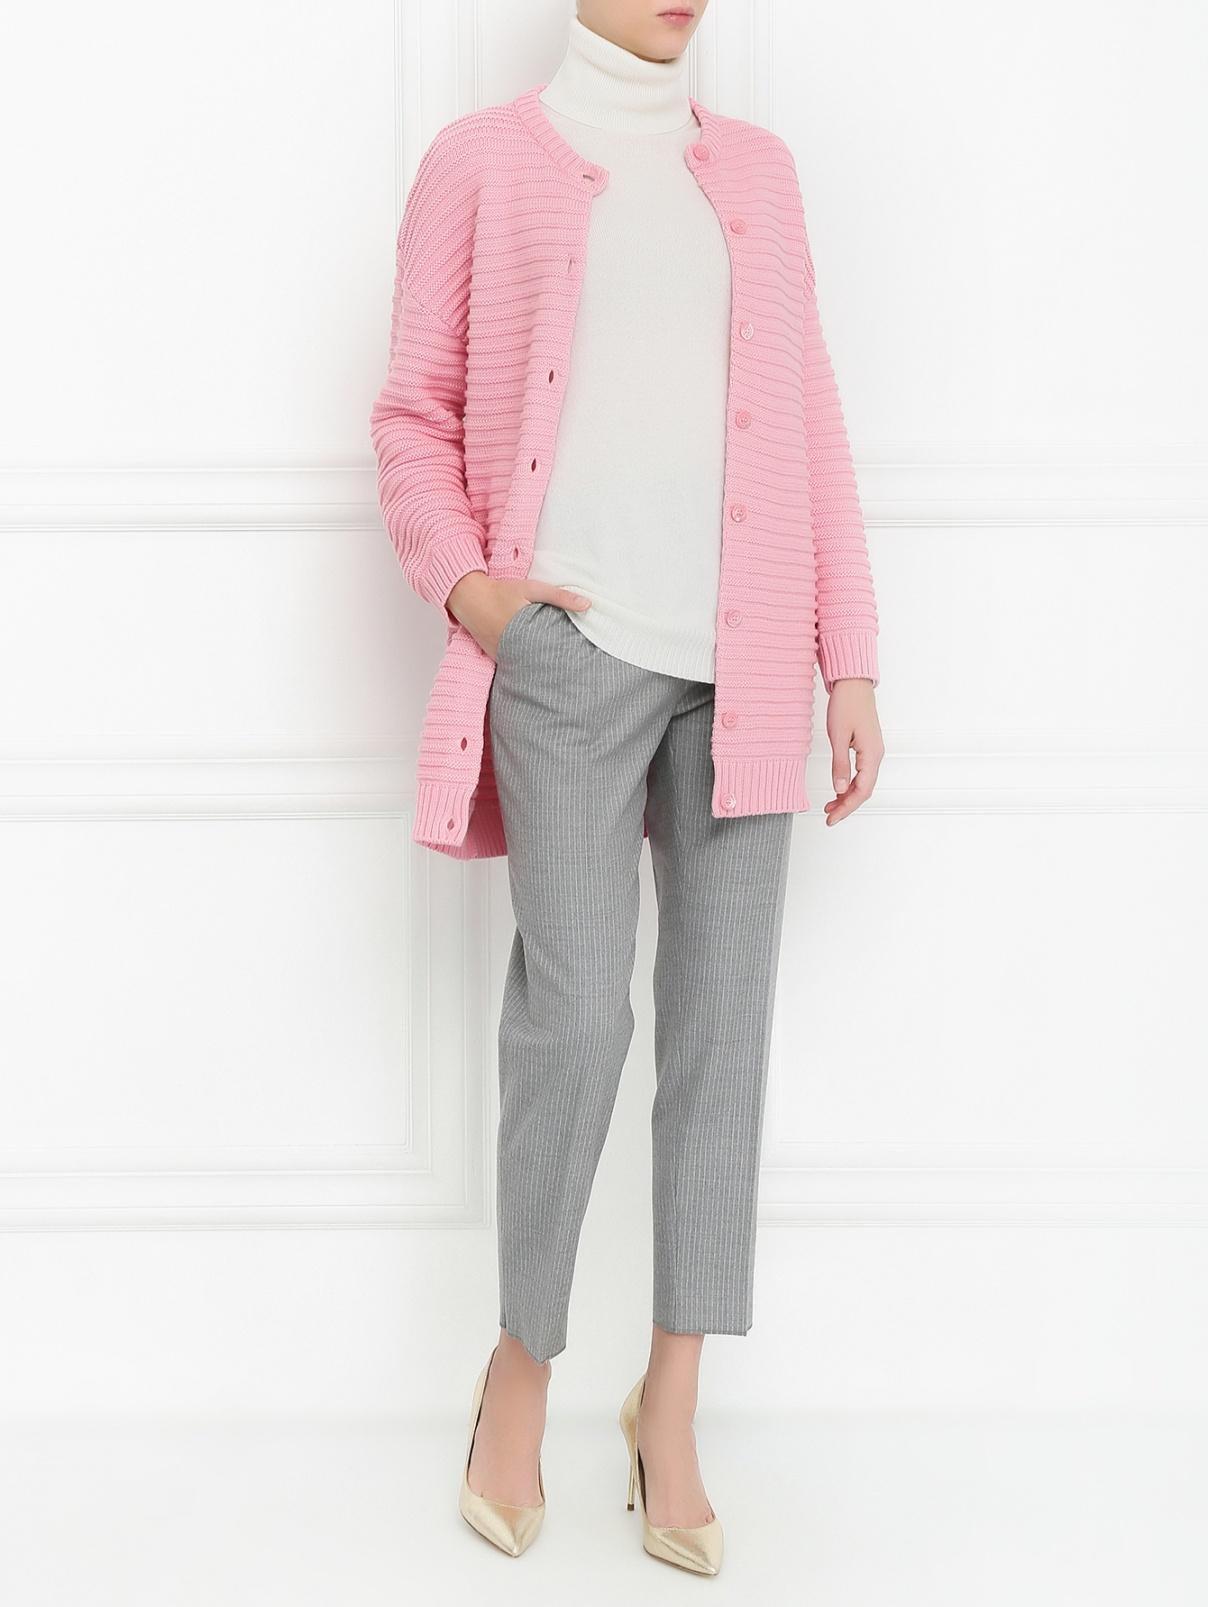 Кардиган из шерсти с боковыми карманами Moschino Boutique  –  Модель Общий вид